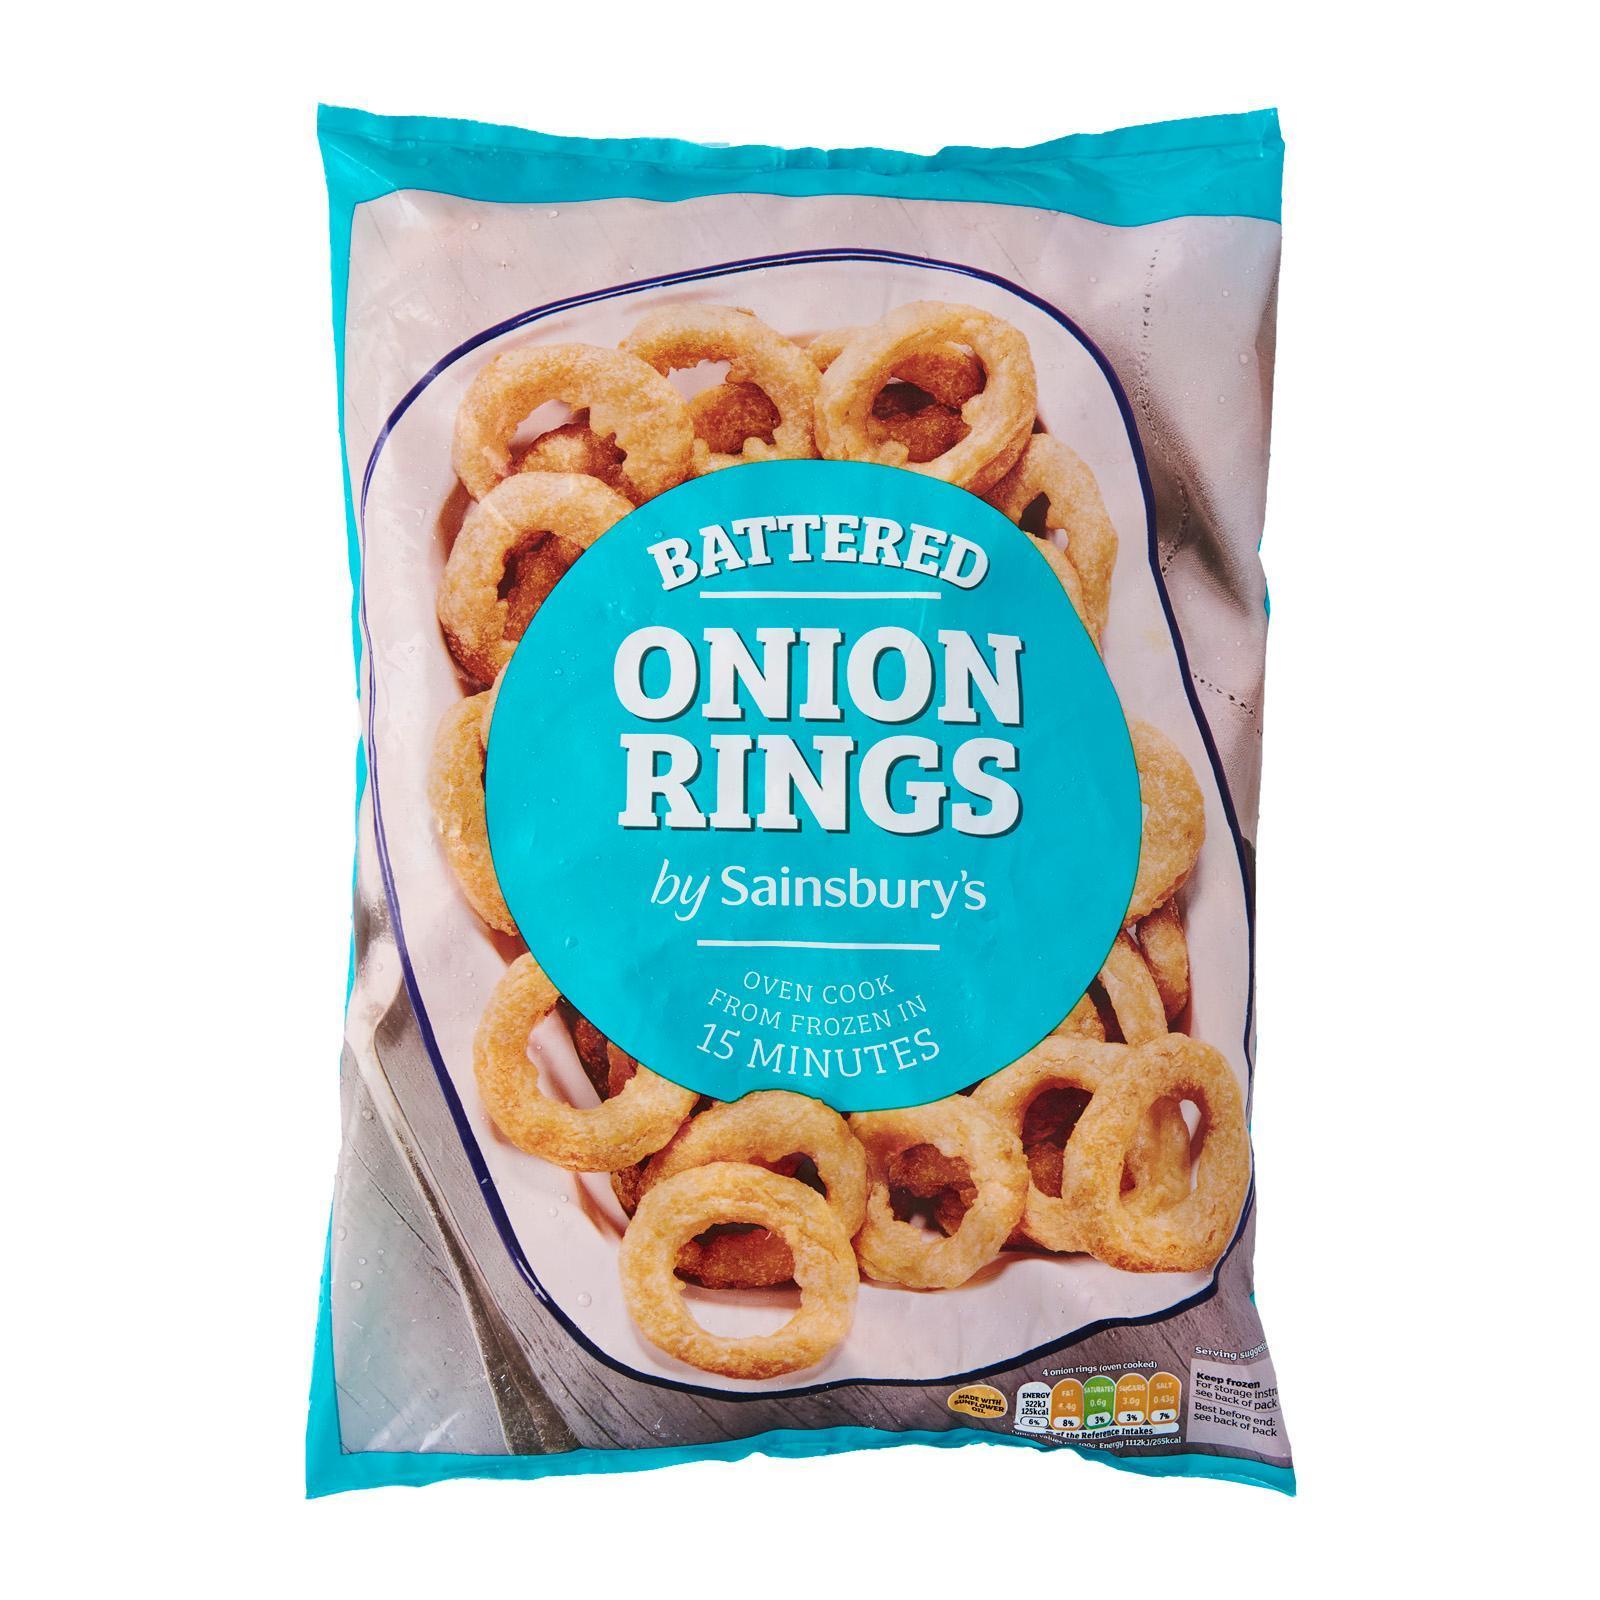 Sainsbury's Battered Onion Rings - Frozen